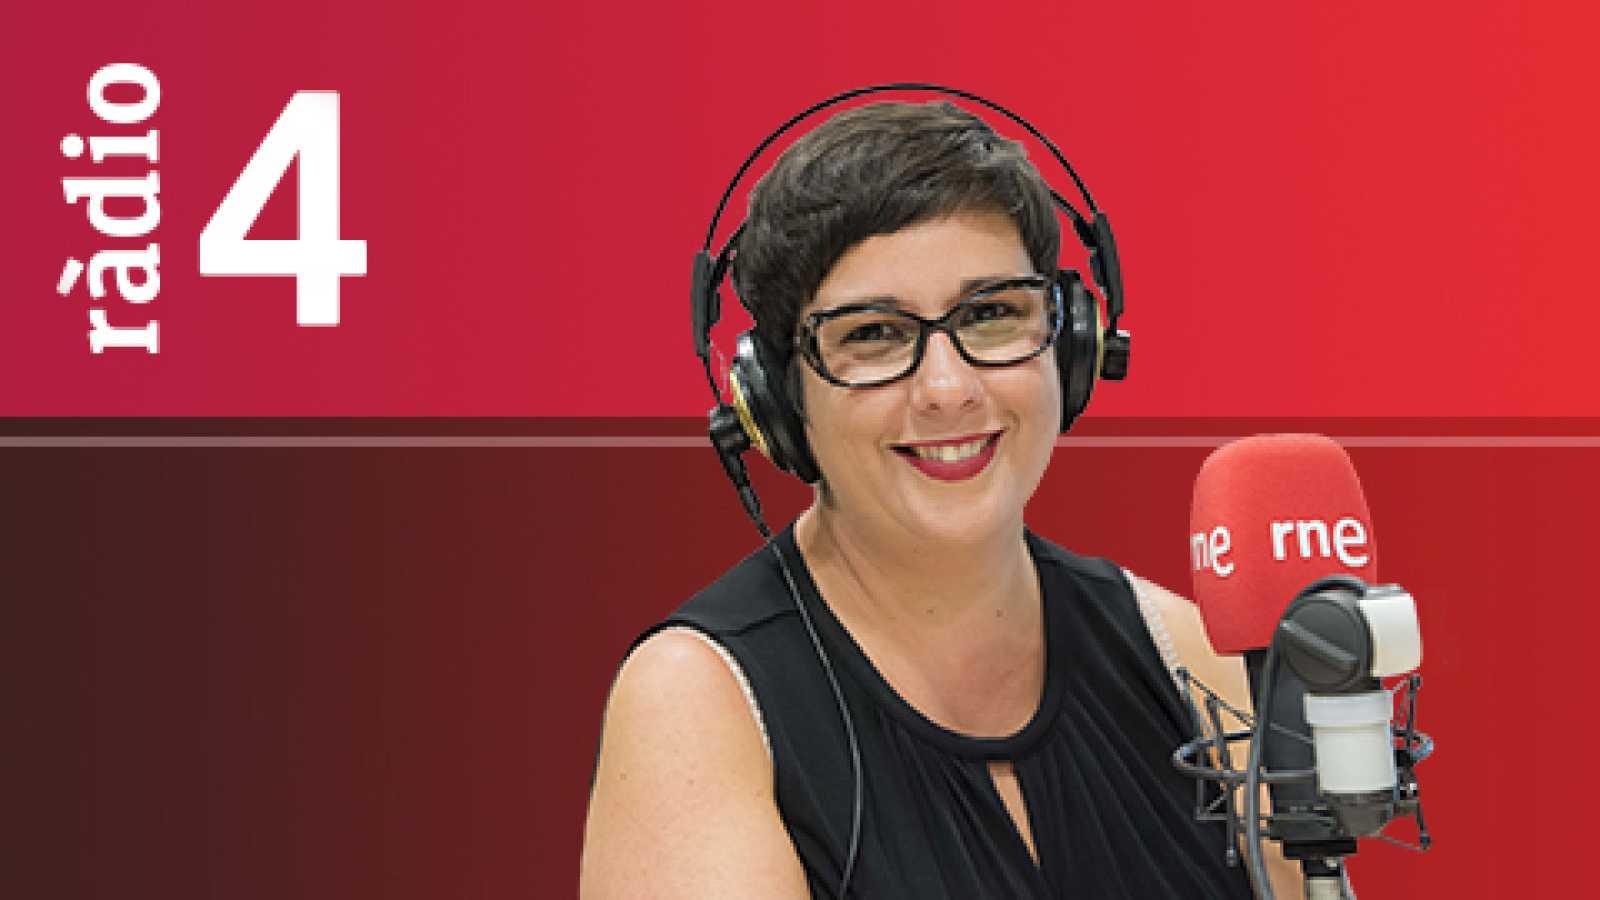 Realpolitik - Jordina Freixanet, Mar Ampurdanés, Lucas Ferro